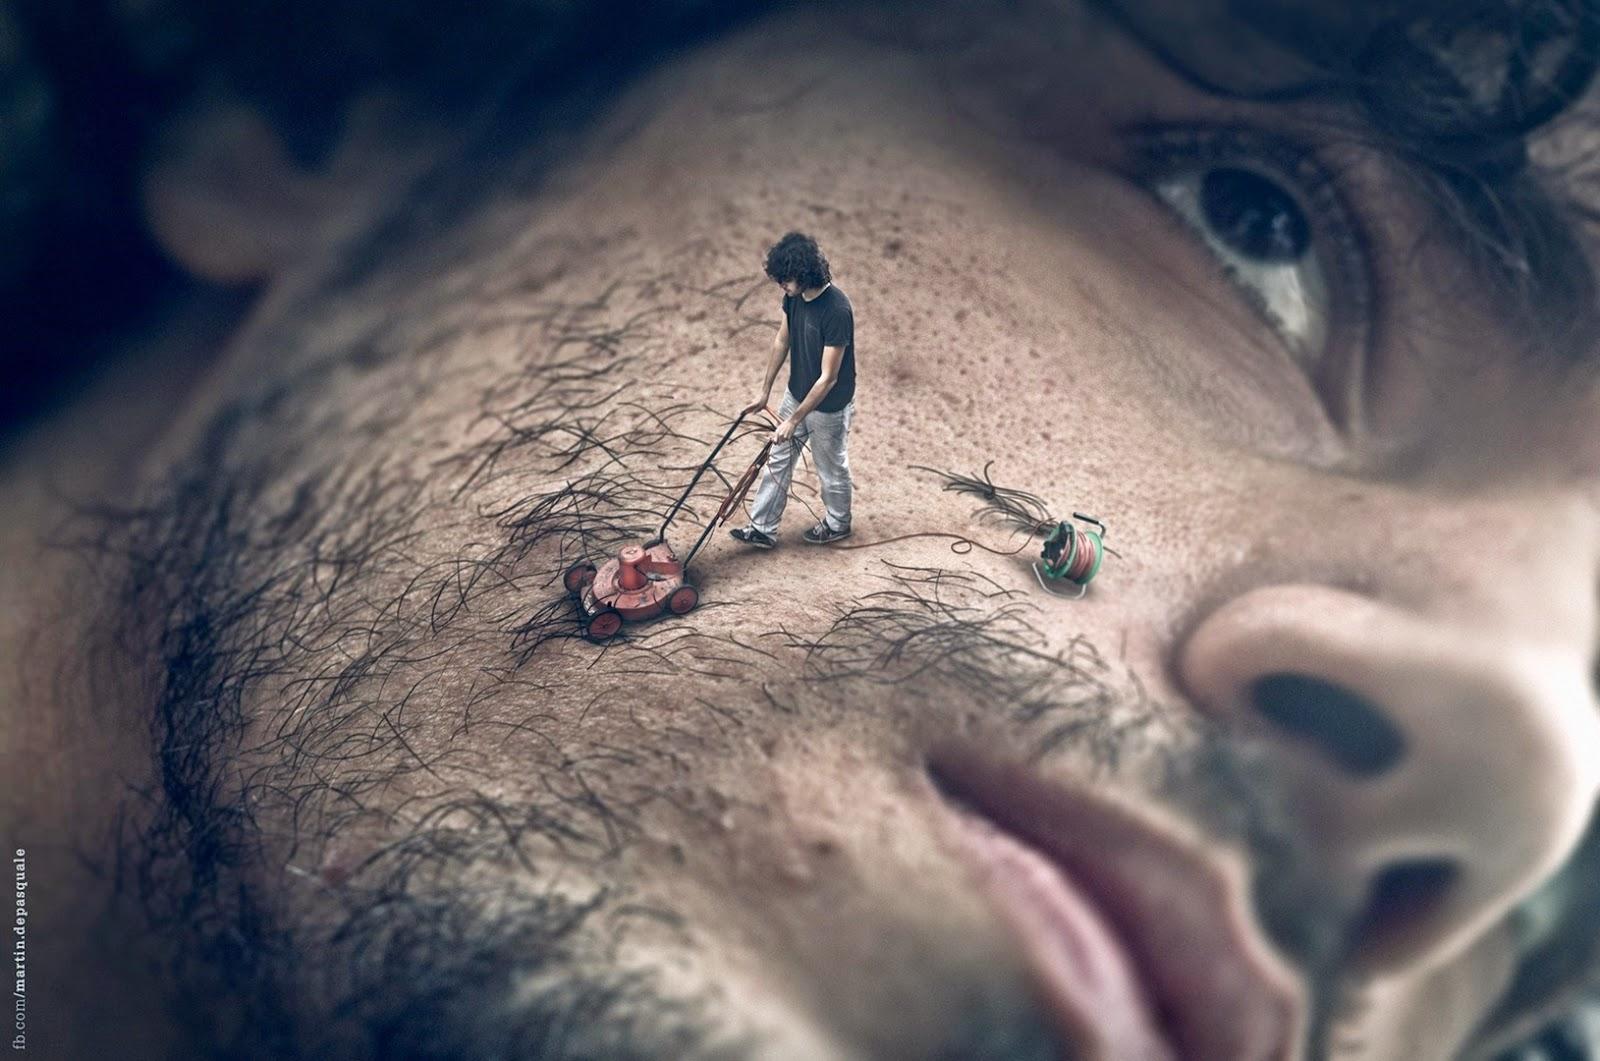 surreal-photography-inspiration-005